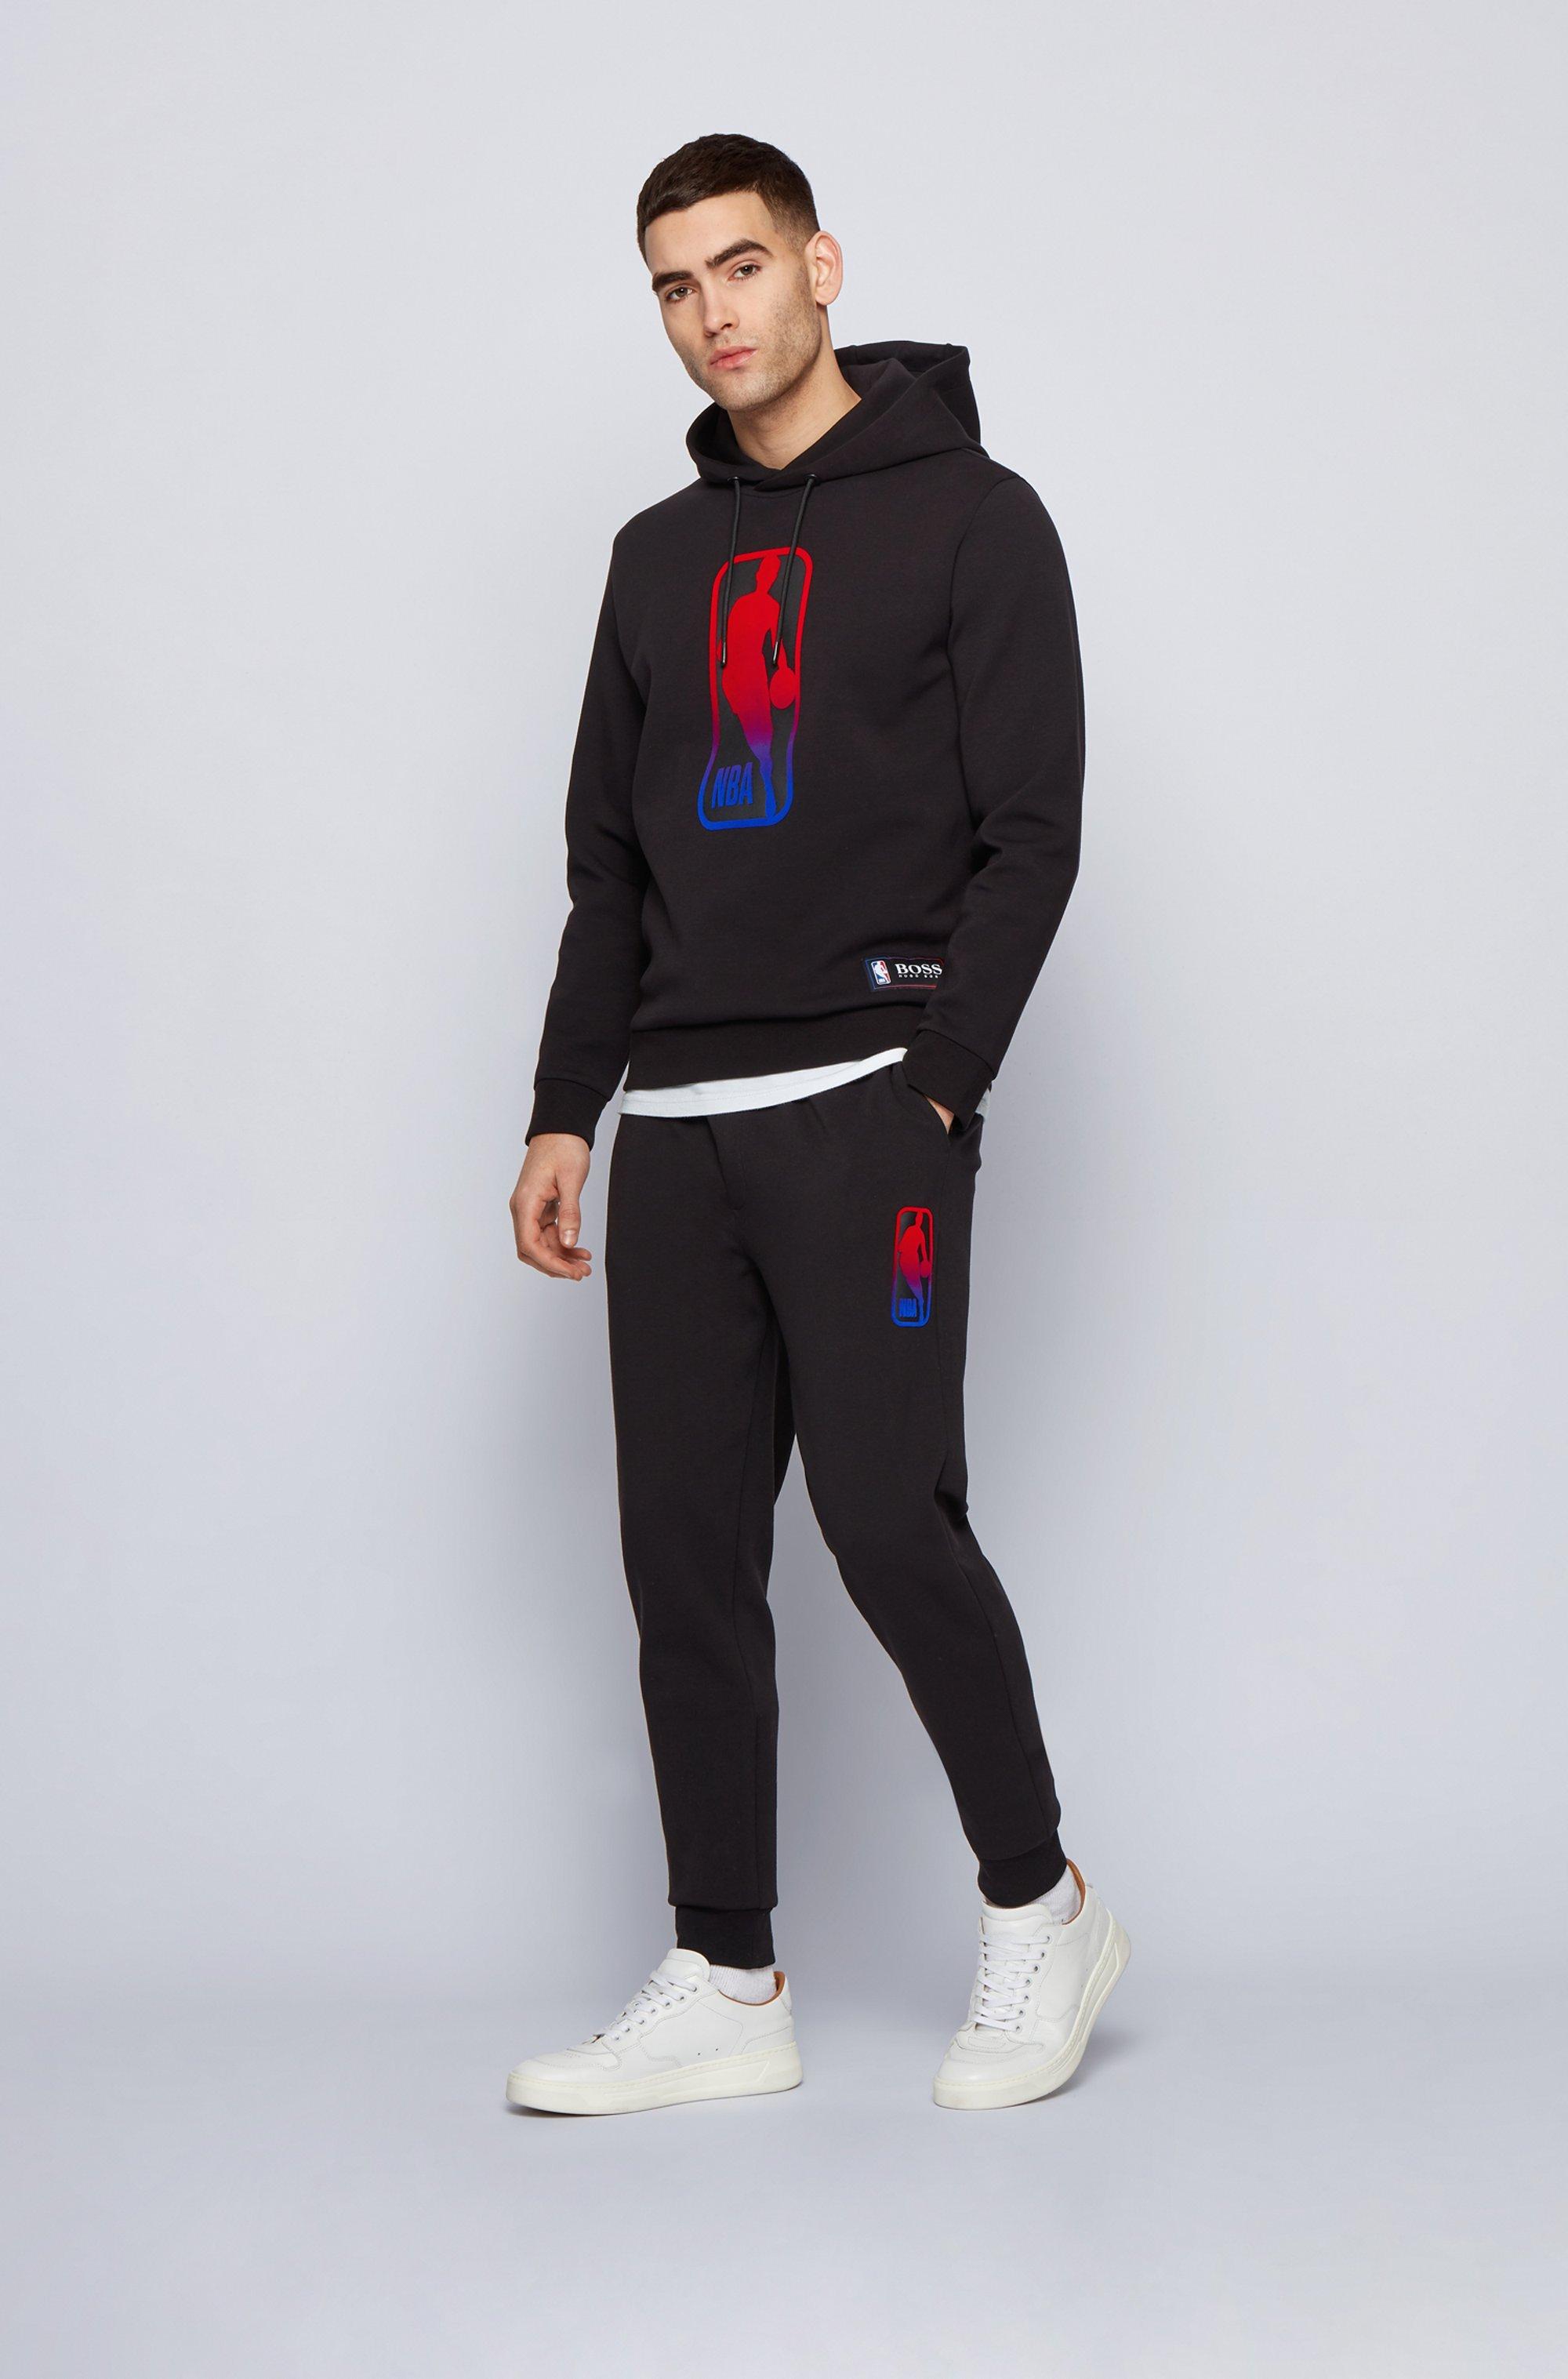 Pantalon de survêtement BOSS x NBA avec logo d'équipe